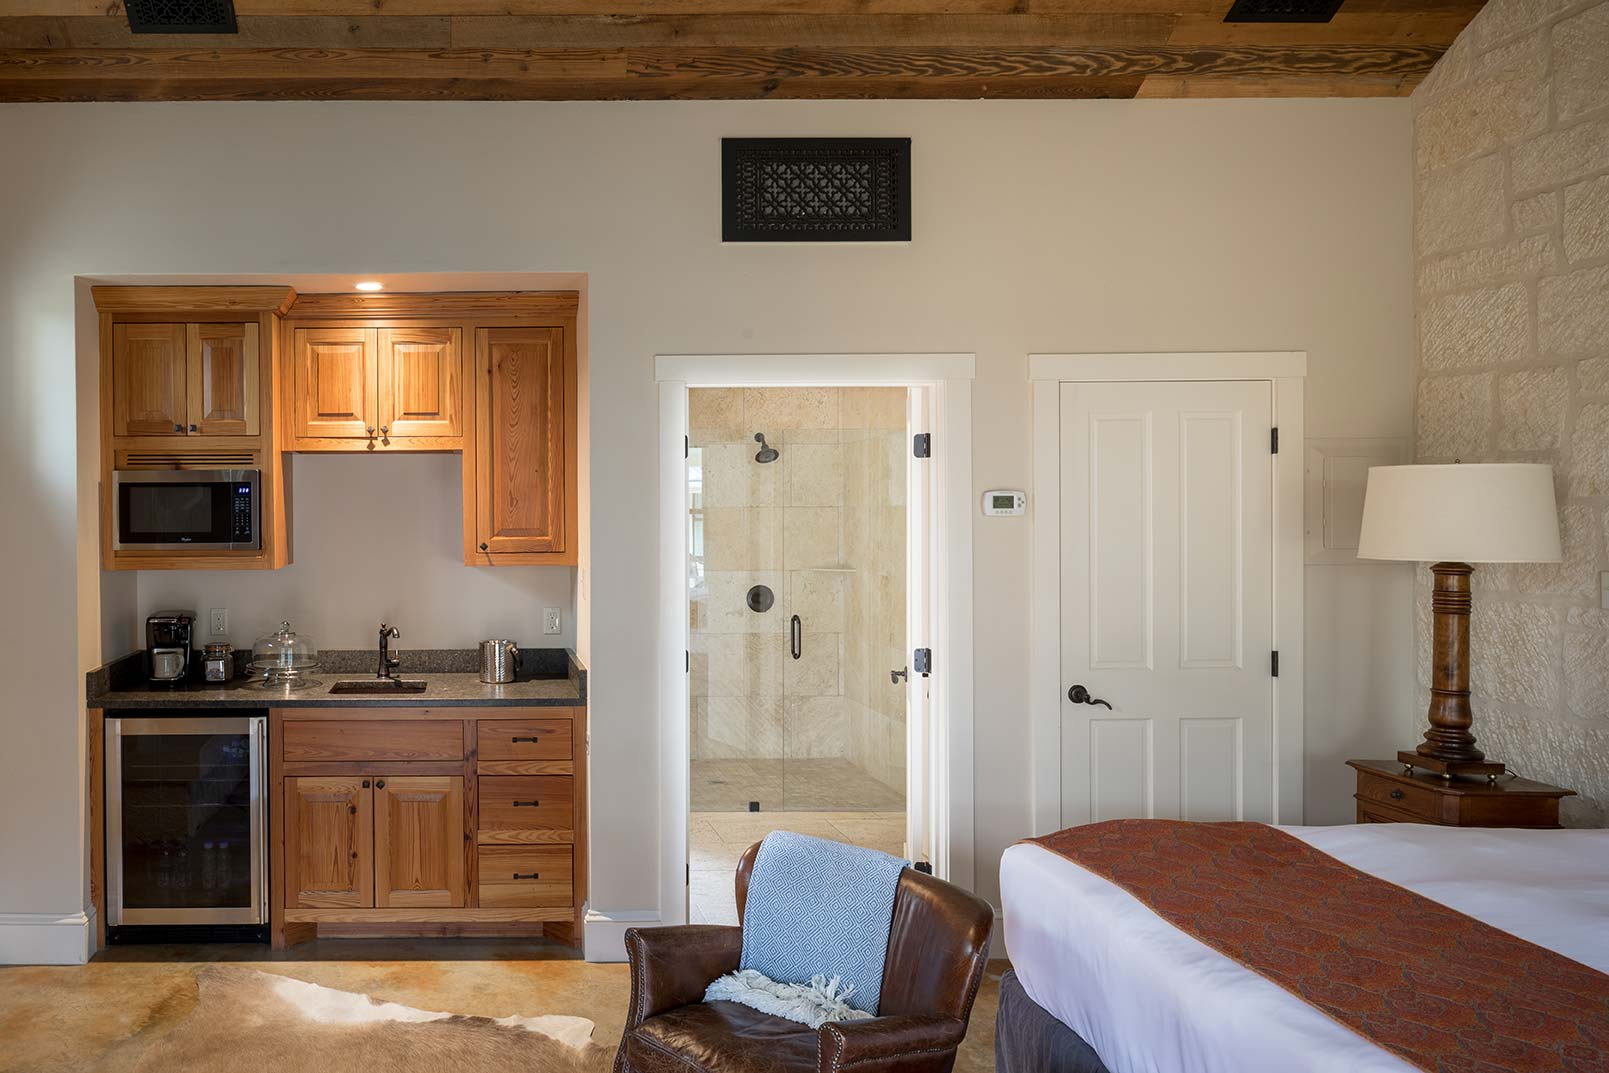 blacksmith-quarters-fredericksburg-realty-texas-commercial-real-estate-for-sale-limestone-cabins-suite.jpg